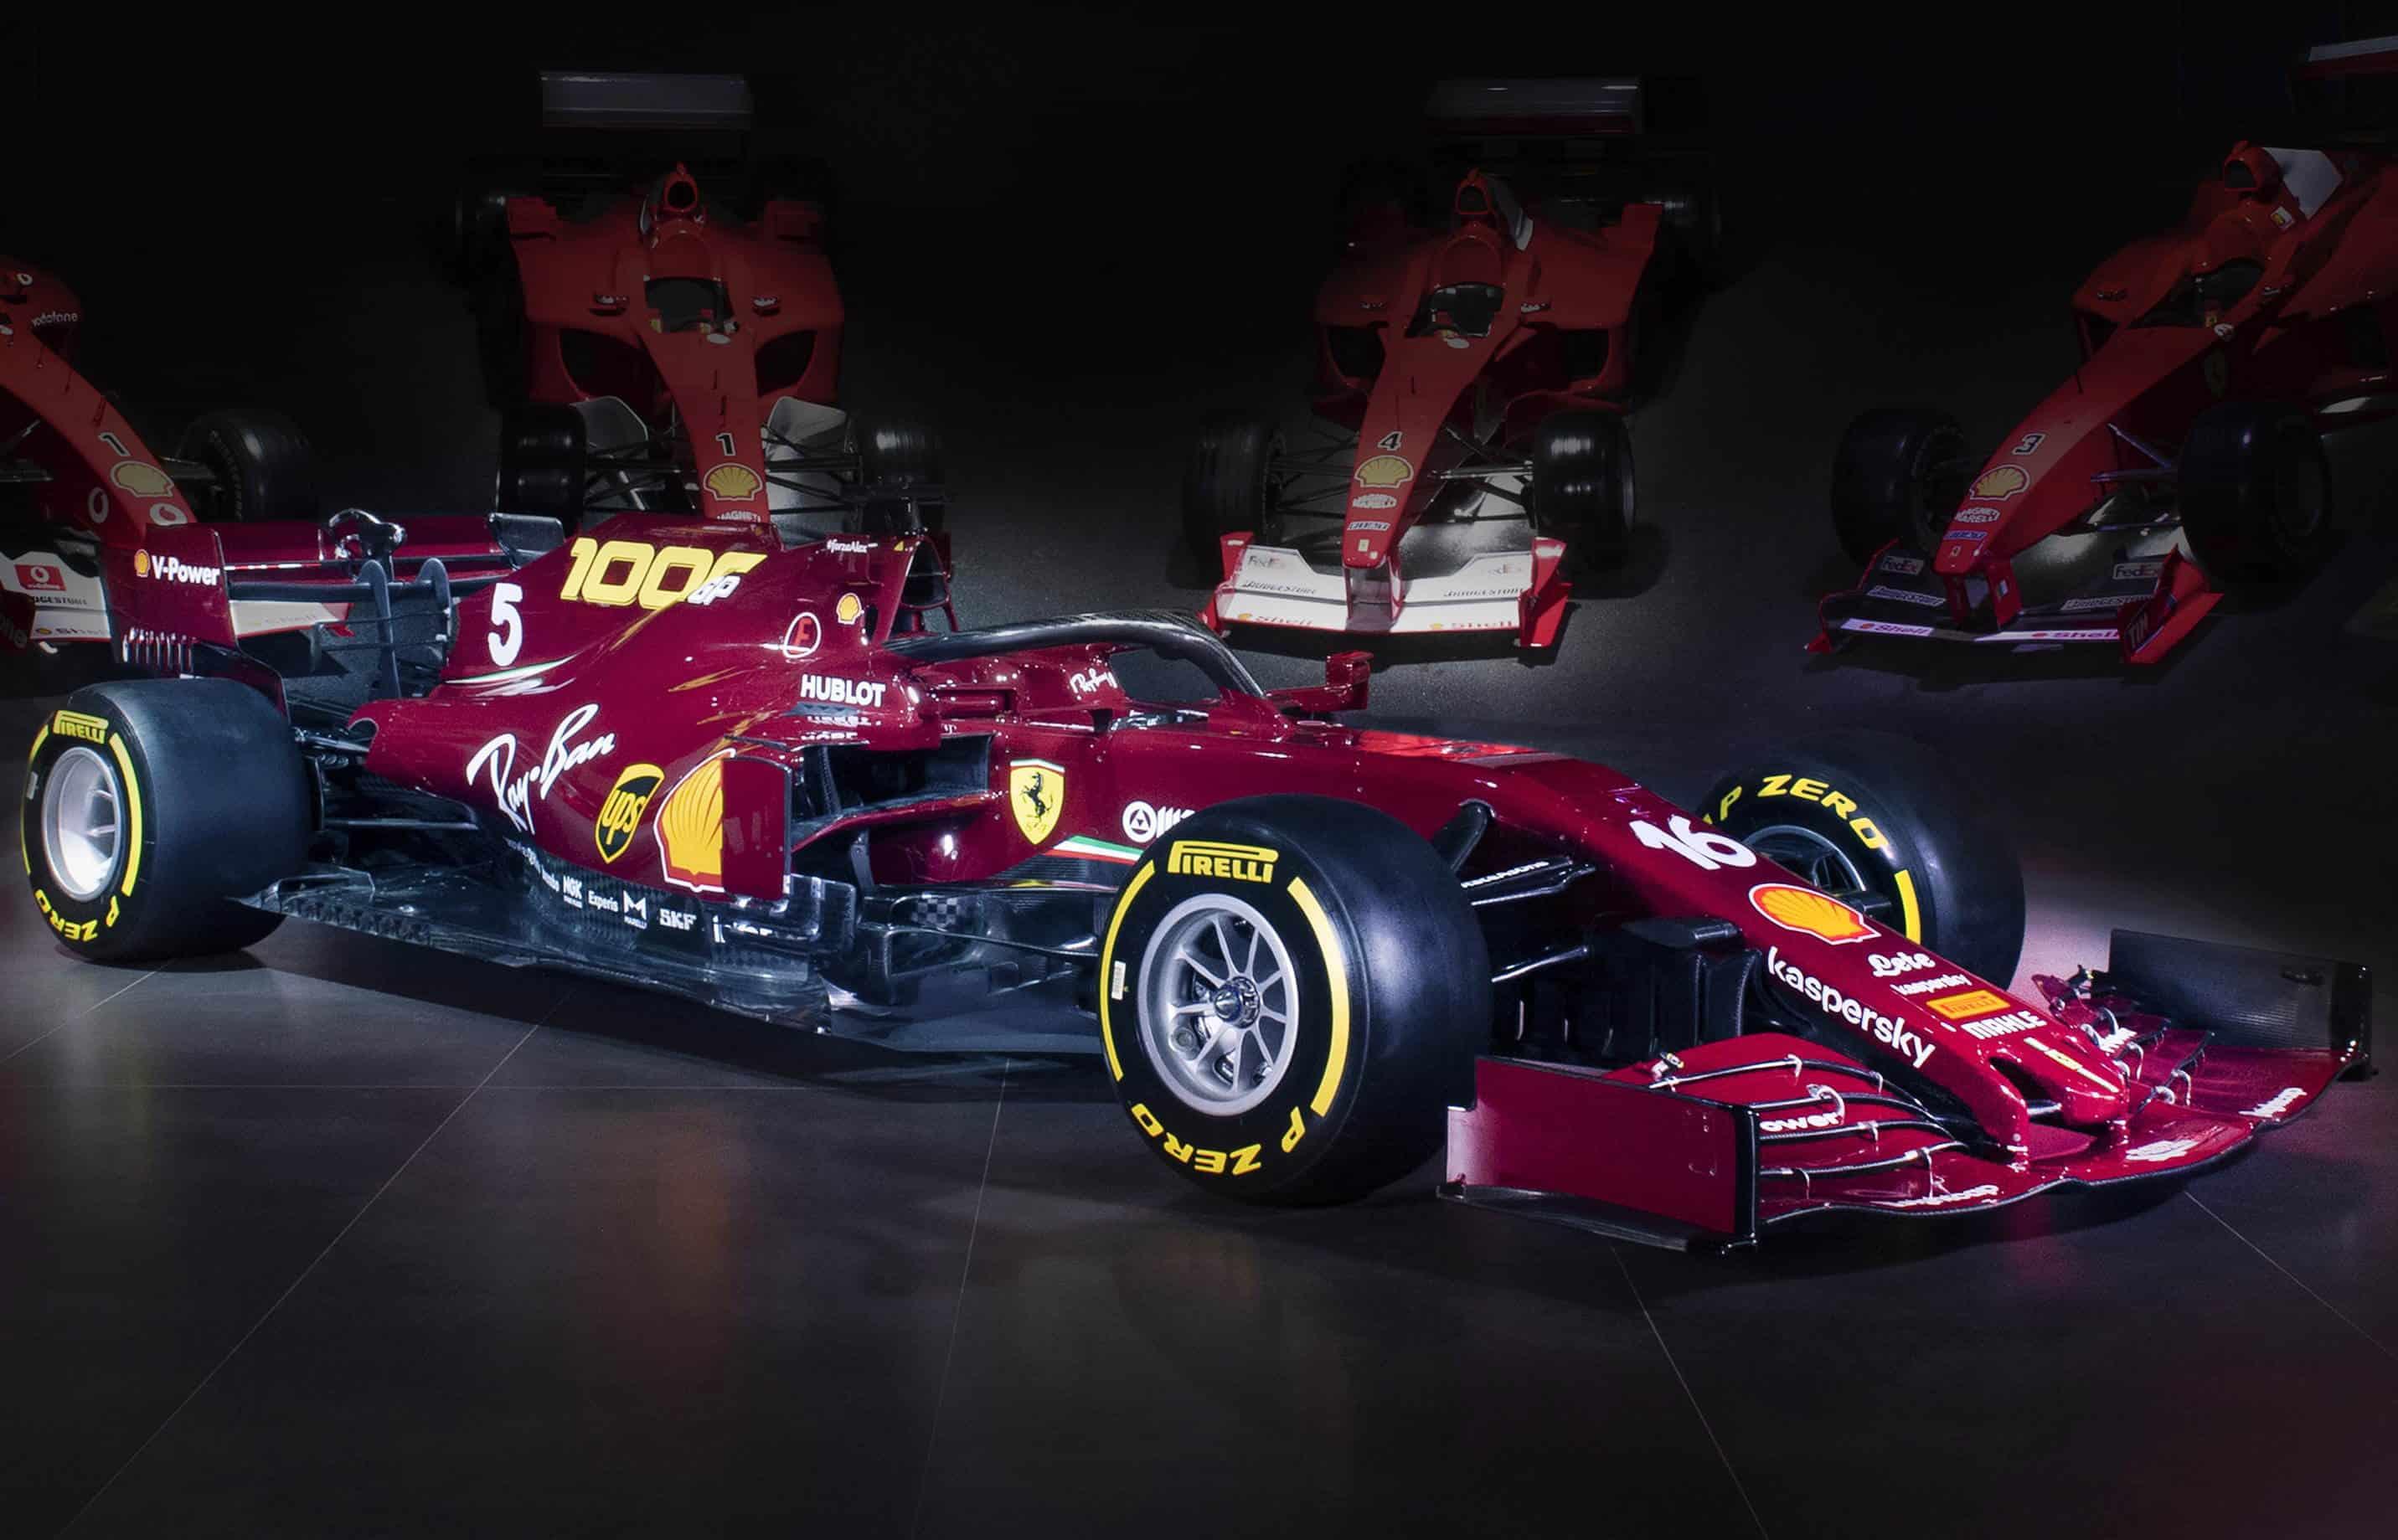 2020 Tuscan GP Ferrari SF1000 special livery zoom hi res Photo Ferrari